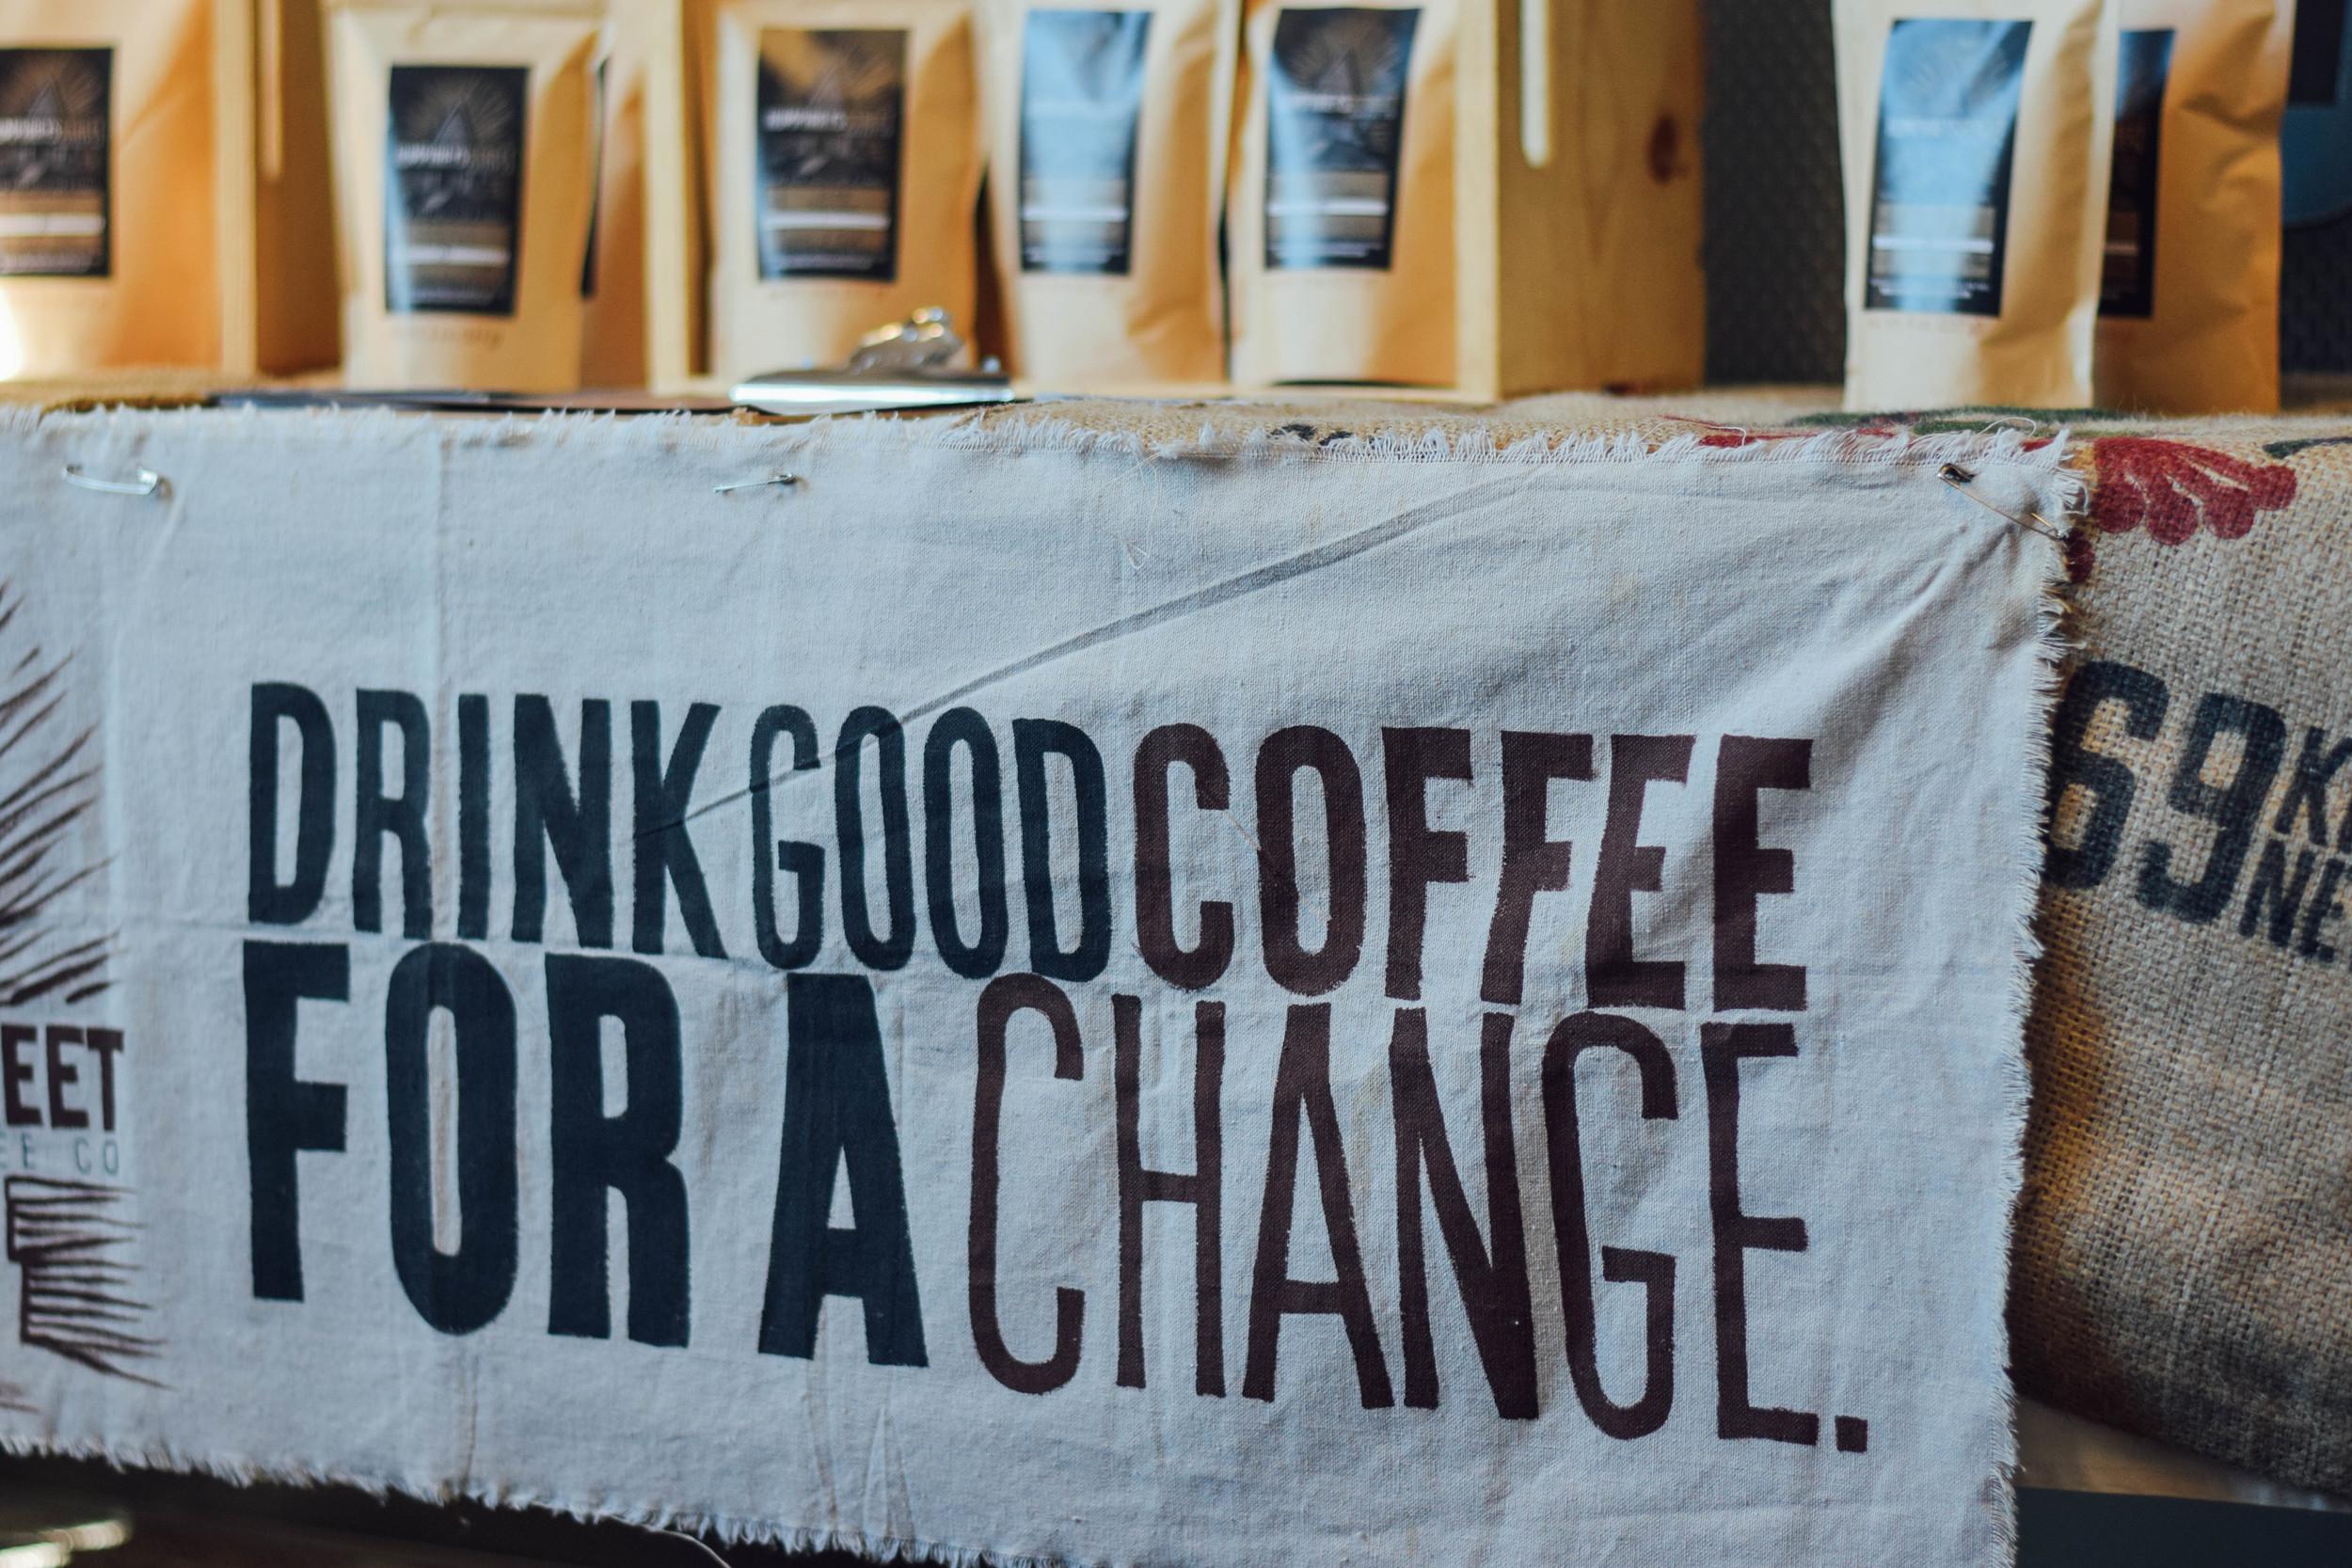 humphry street coffee2.jpg